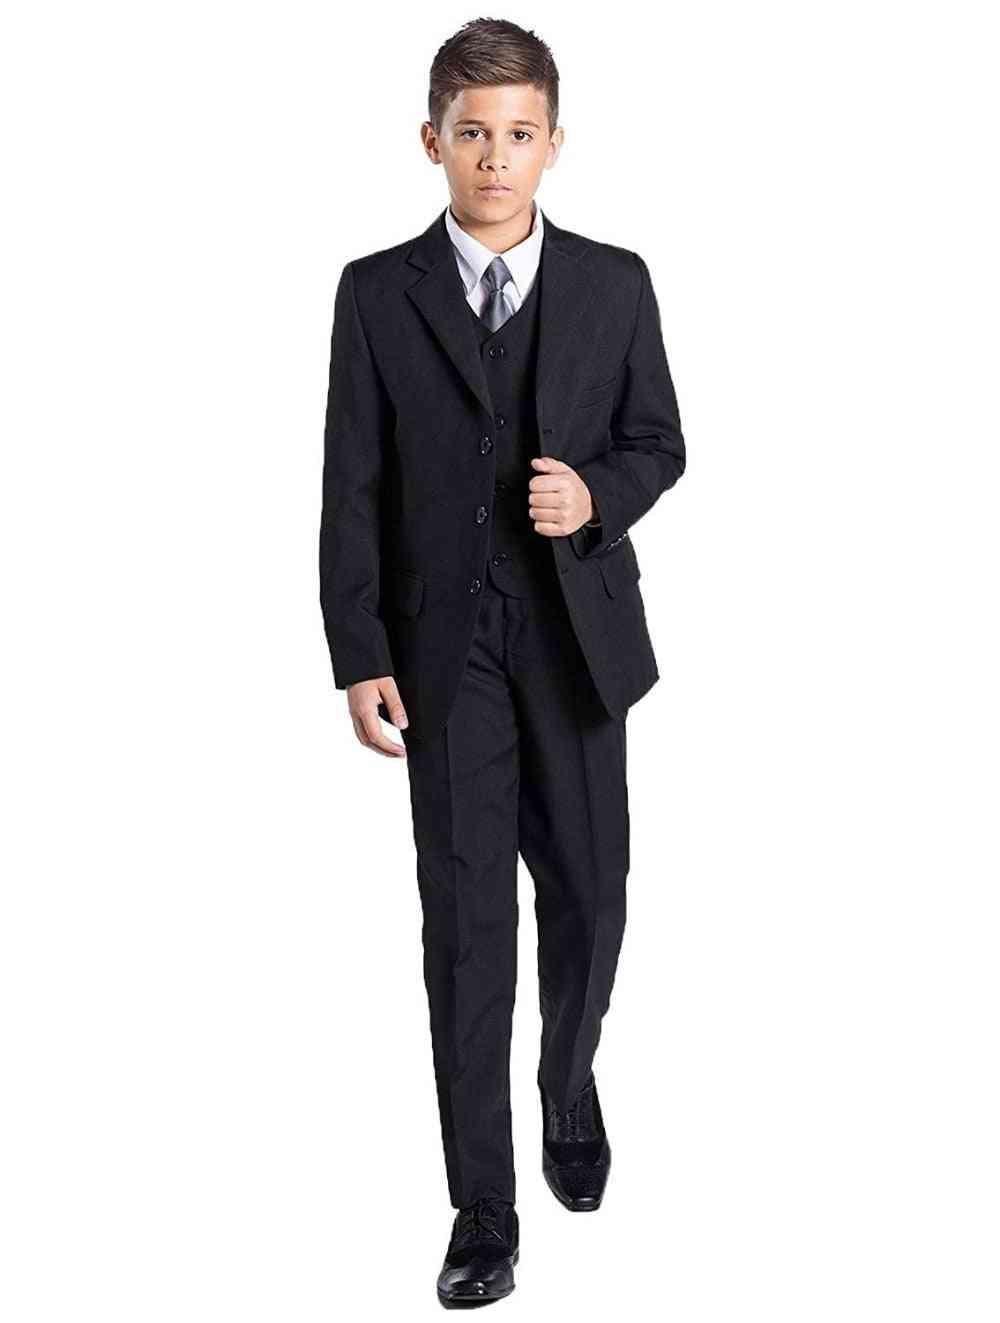 Tuxedo Fist Communication Party Wear Suit For Boy's